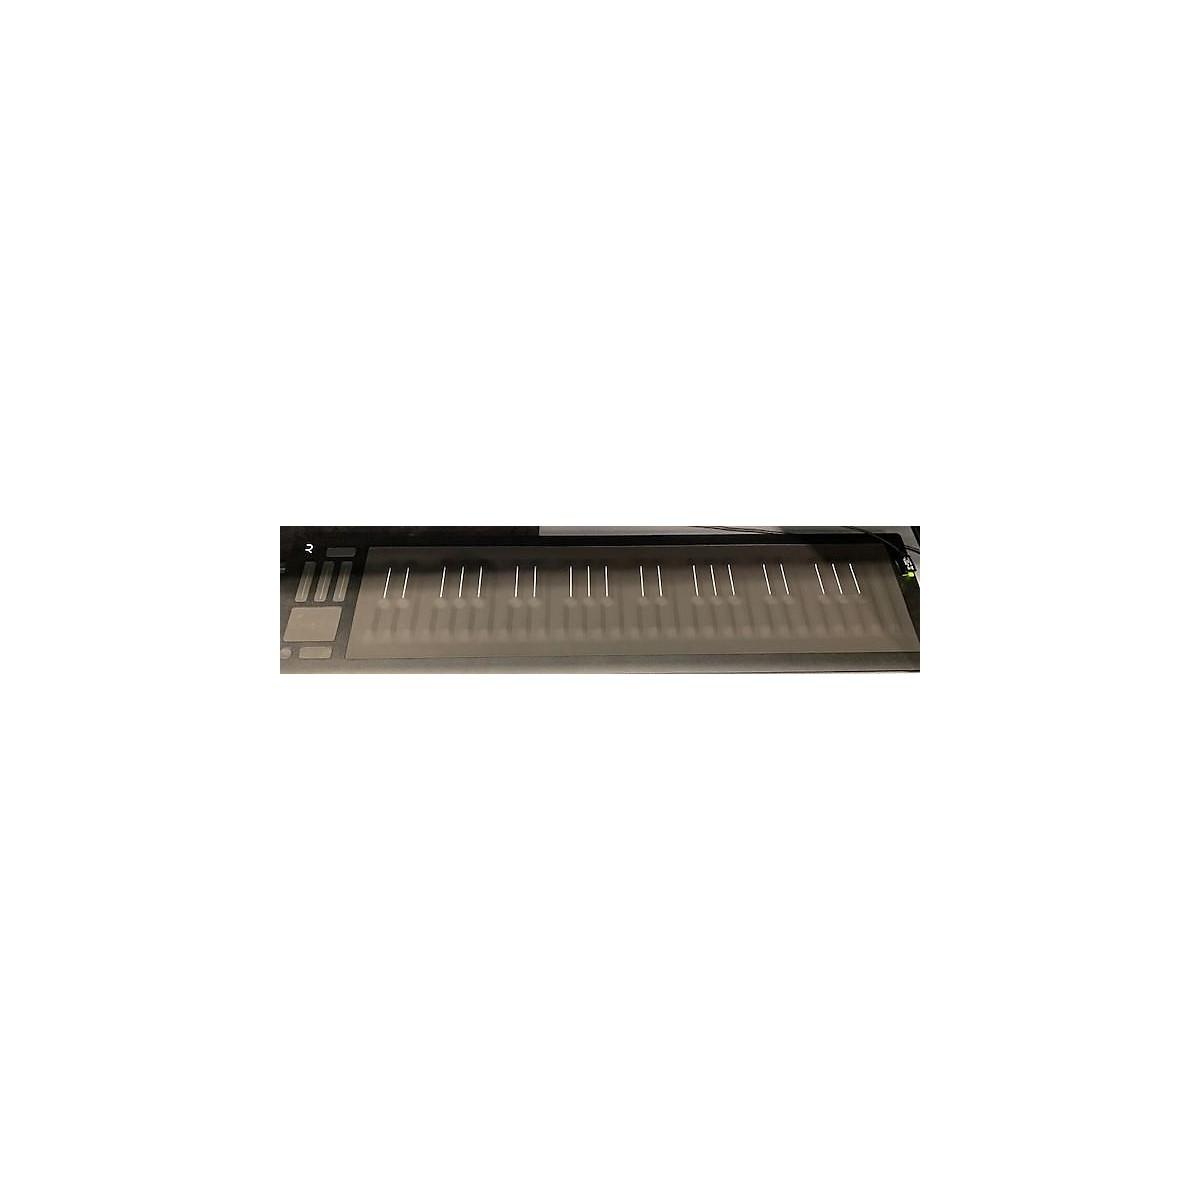 ROLI Seaboard MIDI Controller